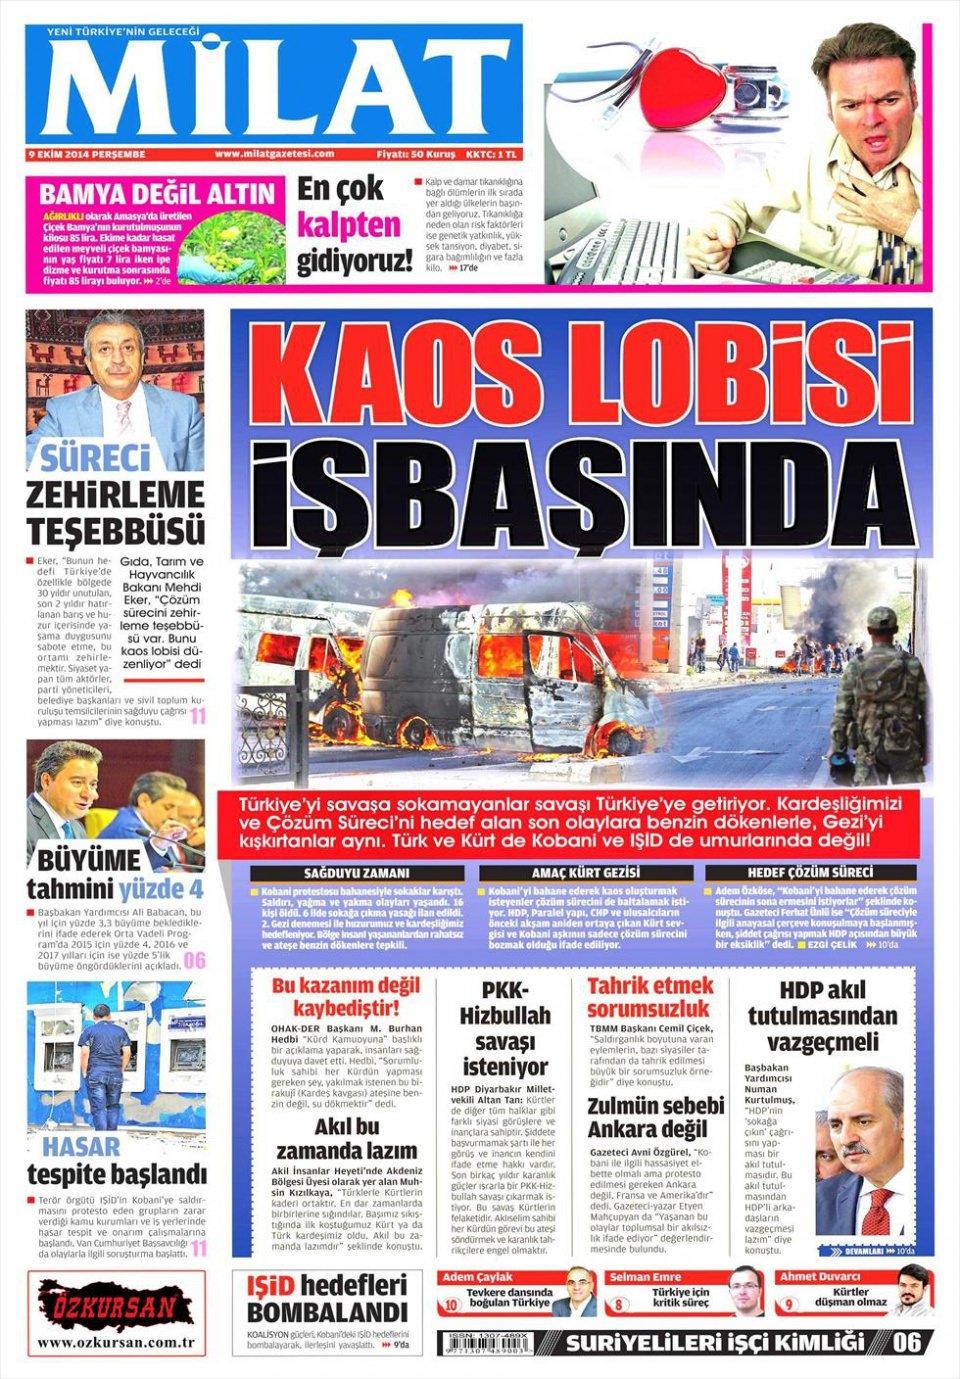 9 Ekim Gazete Manşetleri 10